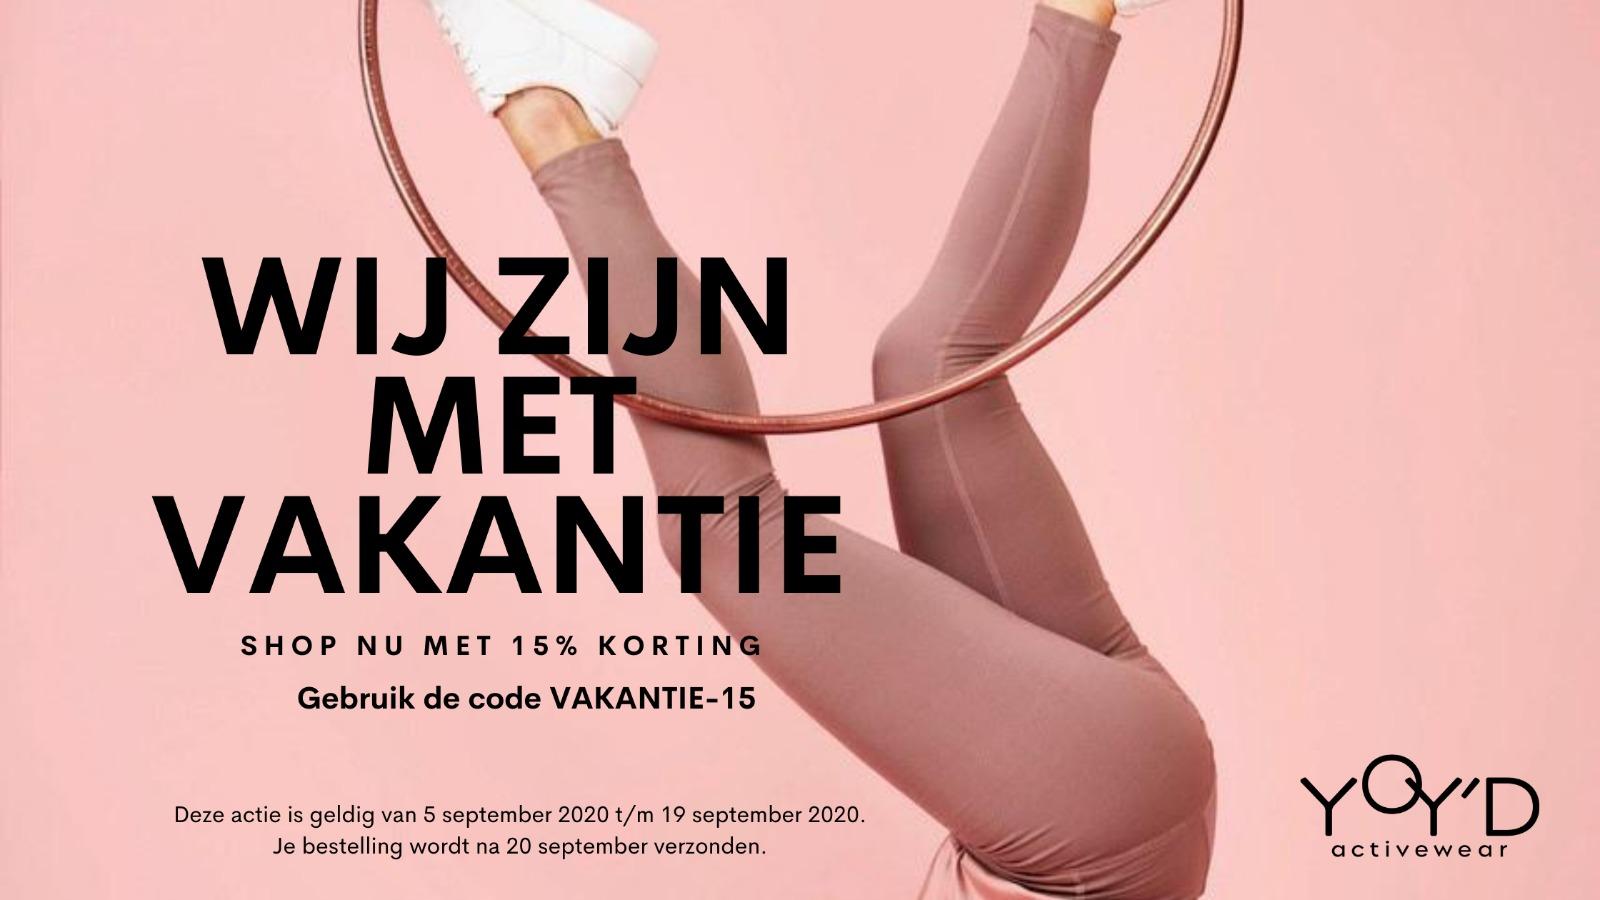 yoydactivewear-vakantie-korting-banner